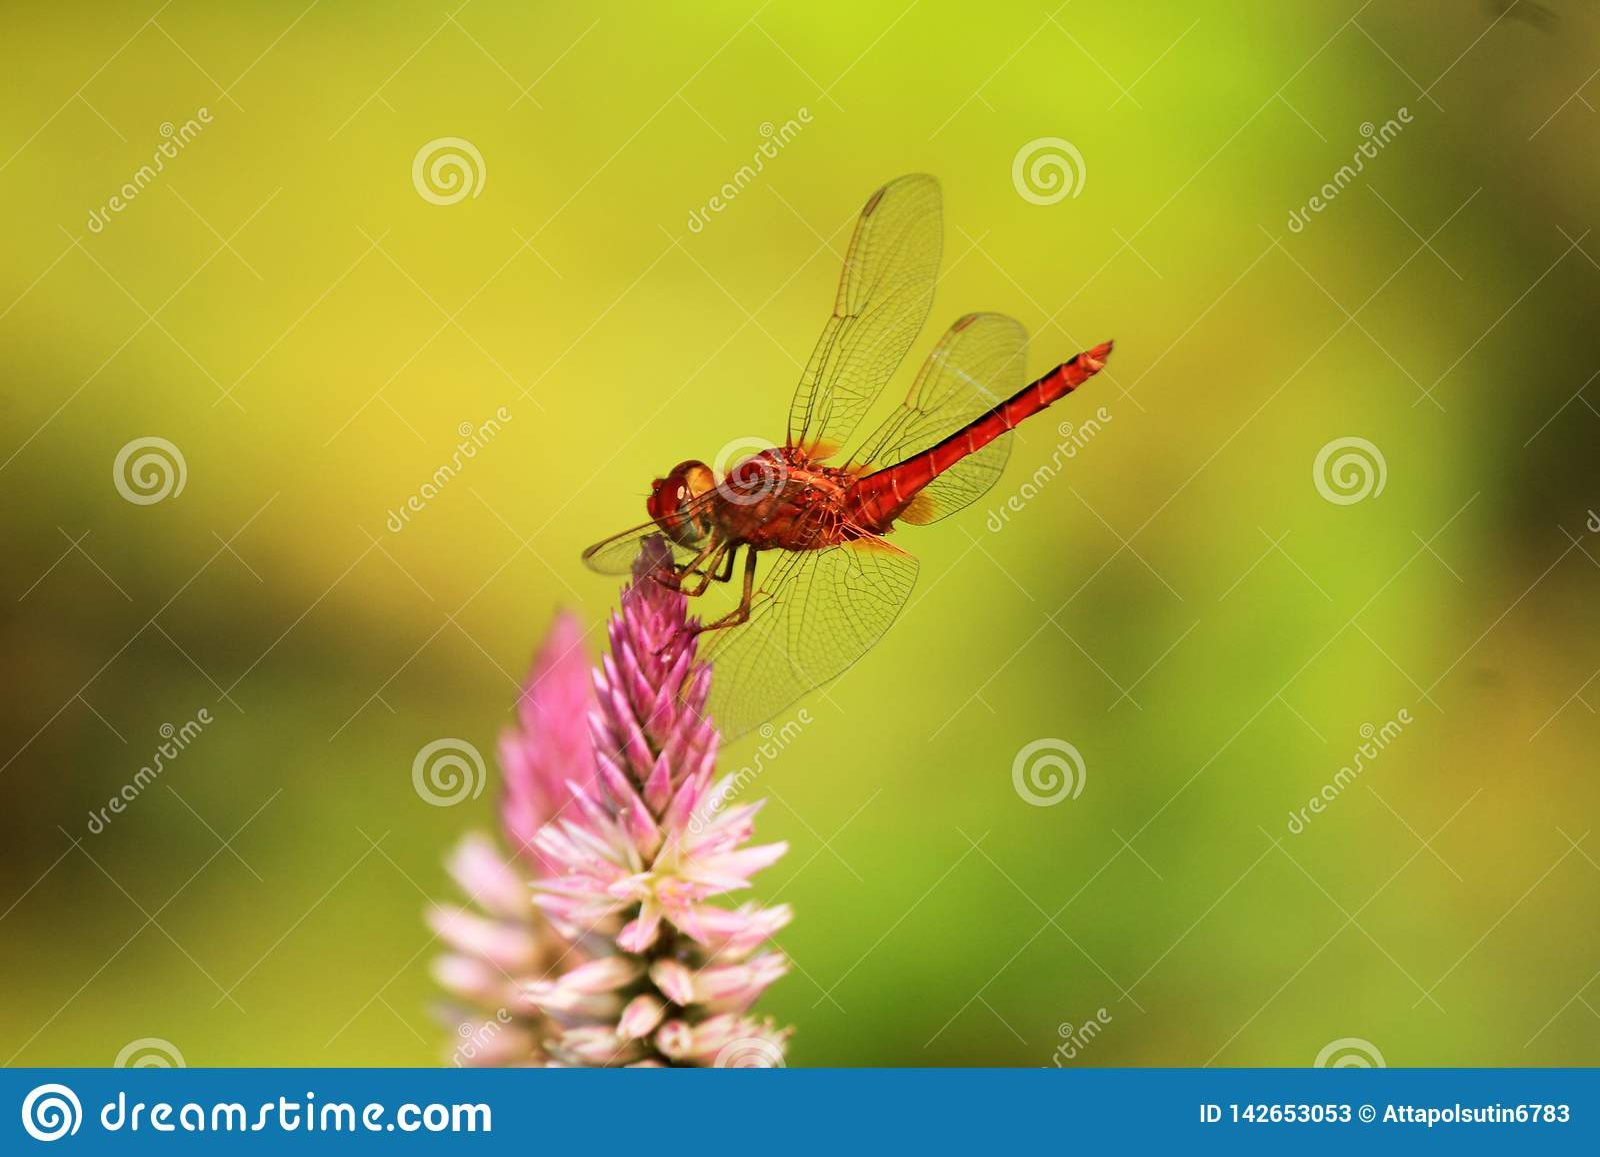 Dragonfly landing on top flower